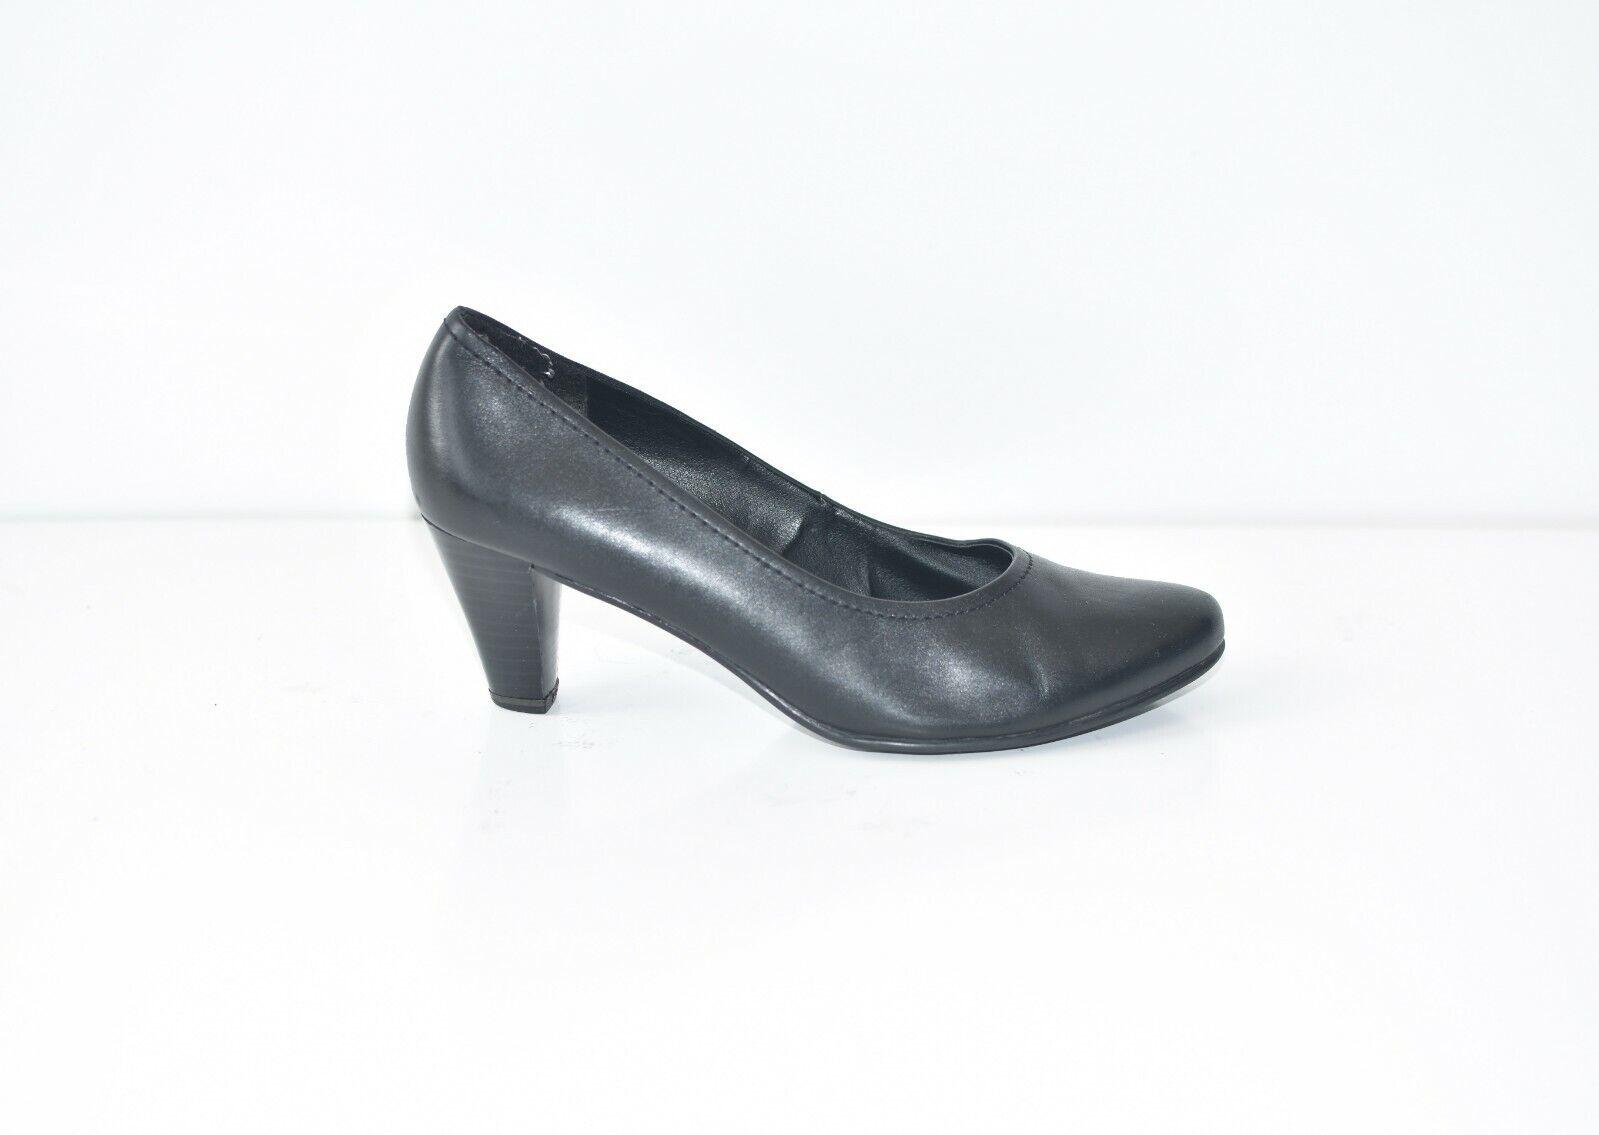 Black Real Leather JANA Mid Heel Court Women's shoes Heels Size UK5.5 EUR38.5